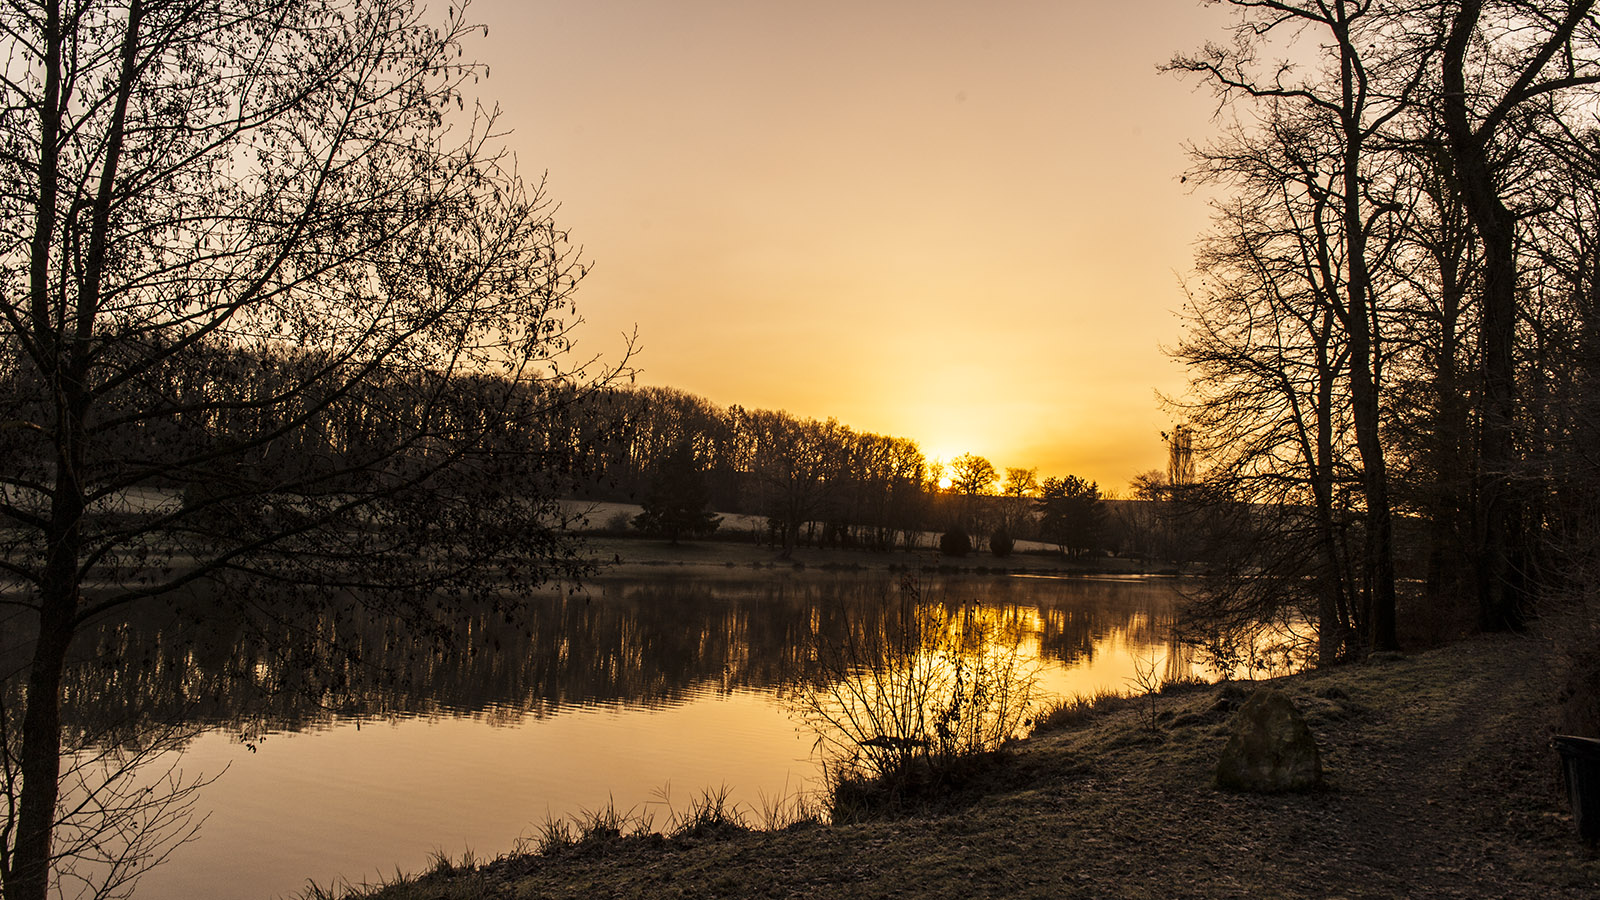 Unterwegs im Berry. La Loubière in Saulzais-le-Potier bei Sonnenaufgang. Foto: Hilke Maunder